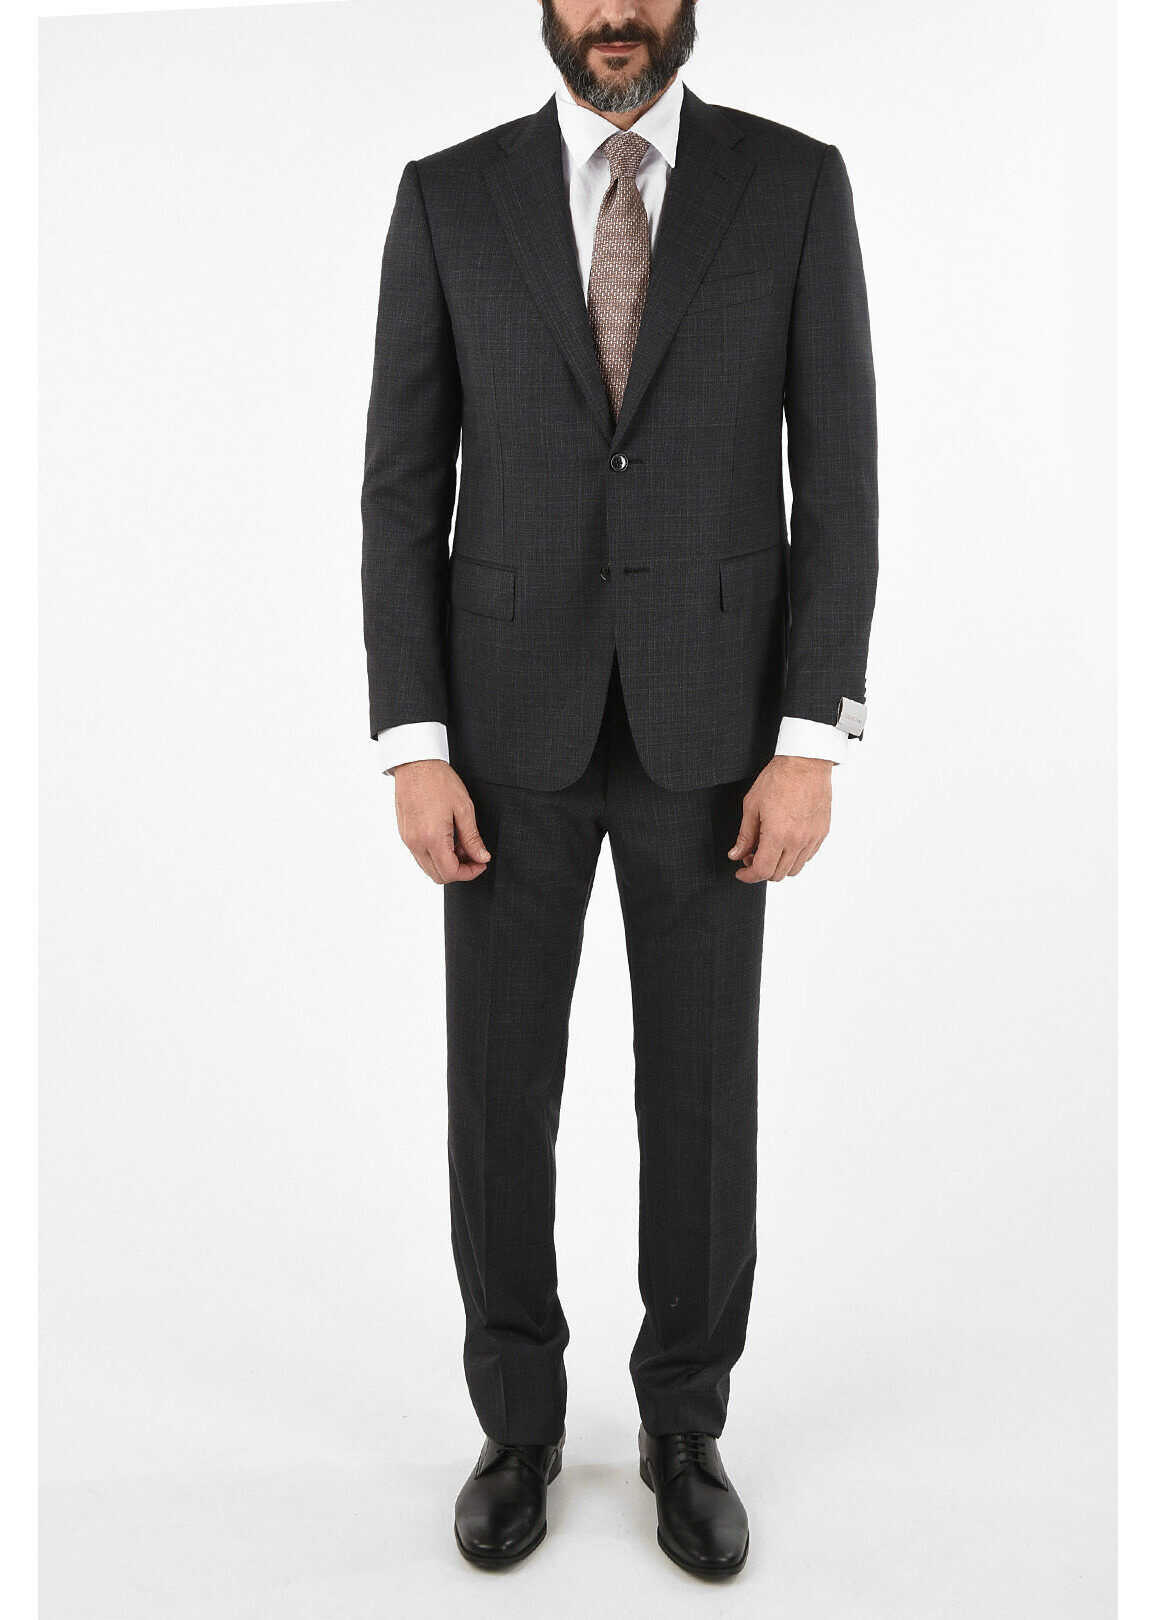 CORNELIANI side vent check drop 6R 2-button MANTUA suit GRAY imagine